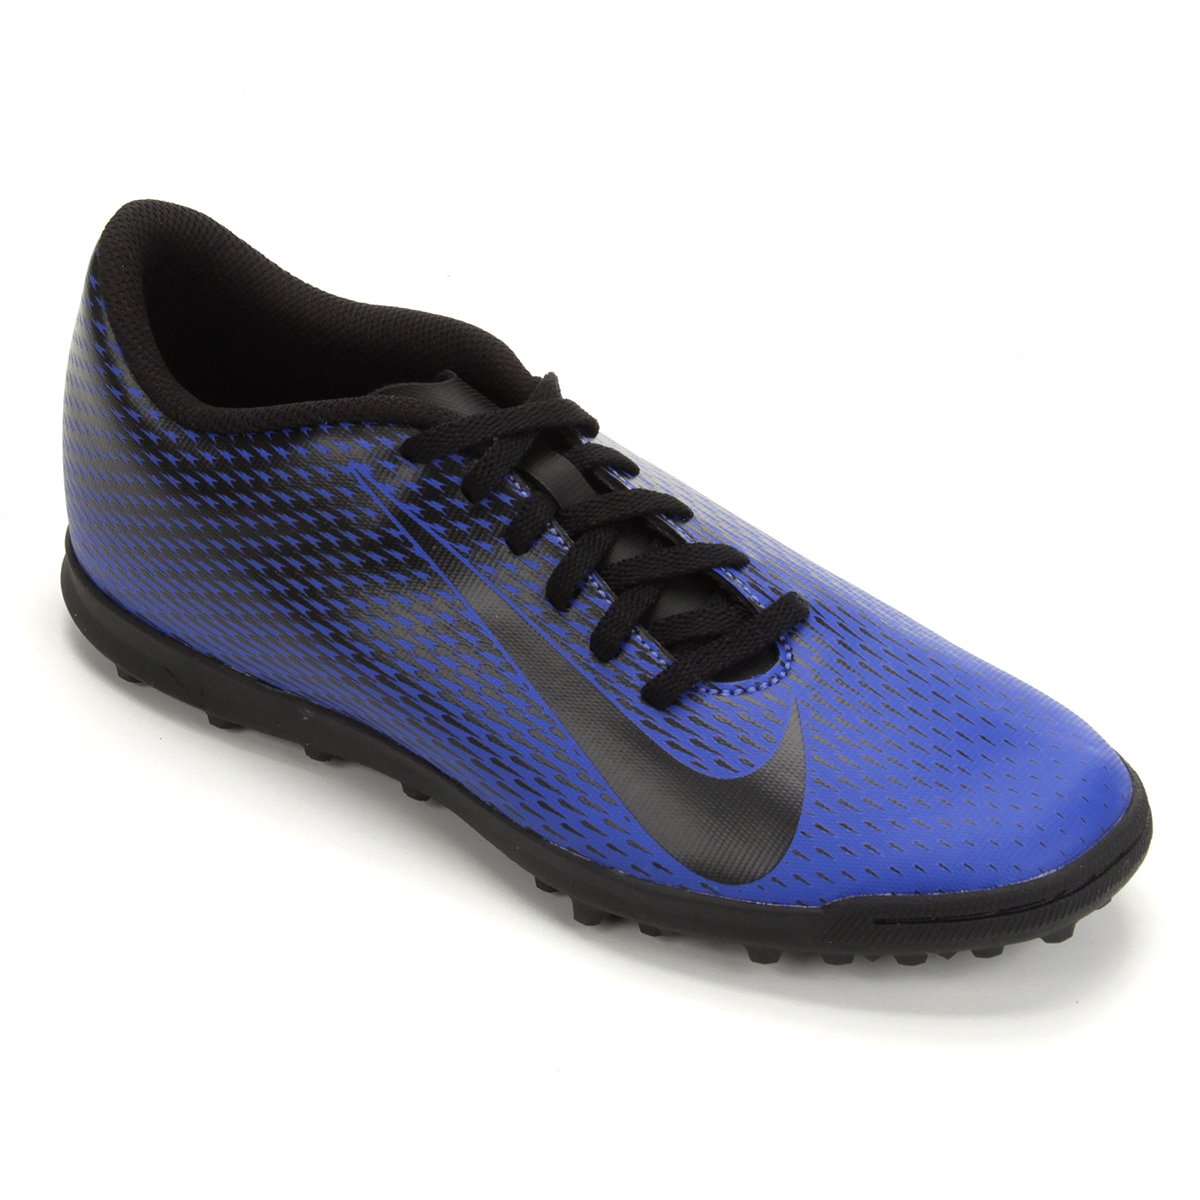 e6e16904894 Chuteira Society Nike Bravata 2 TF - Azul e Preto - Compre Agora ...